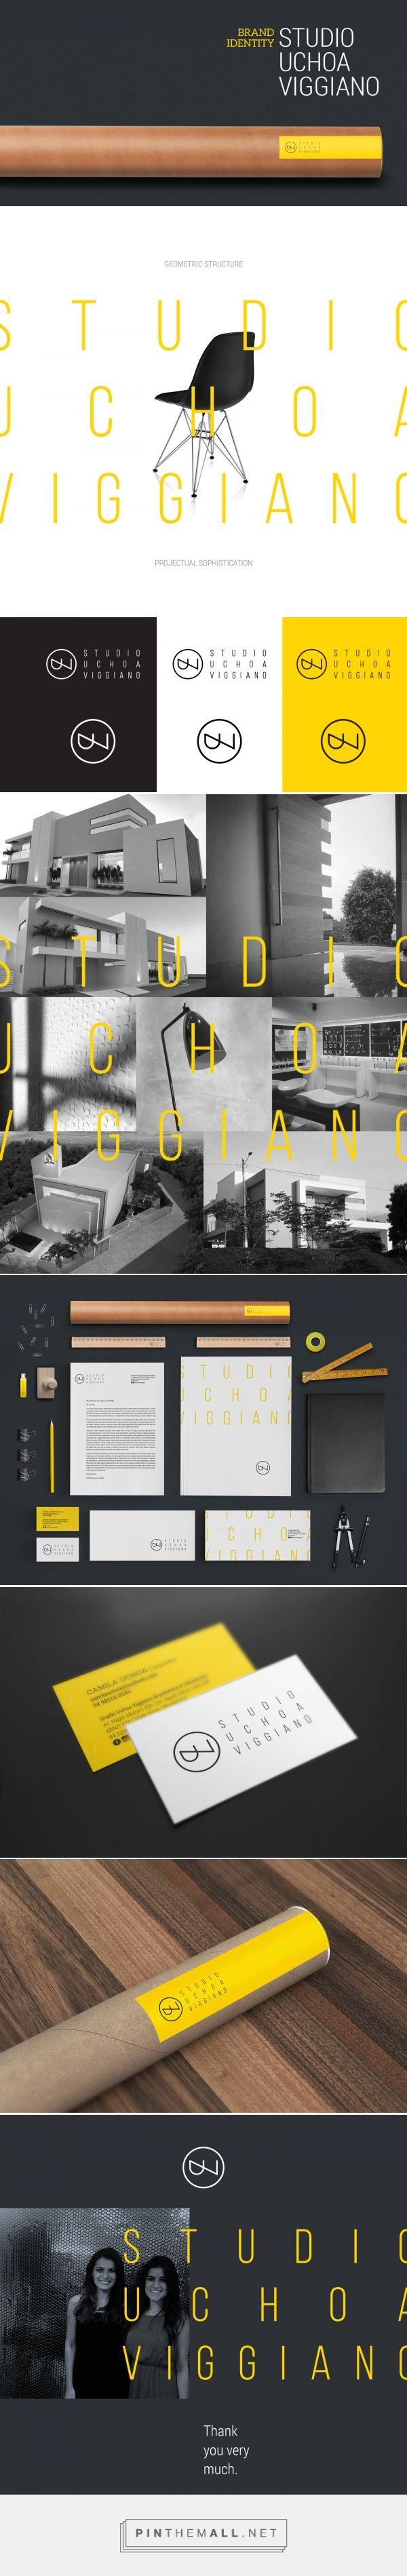 Studio Uchoa Viggiano Architecture Branding by Johnny